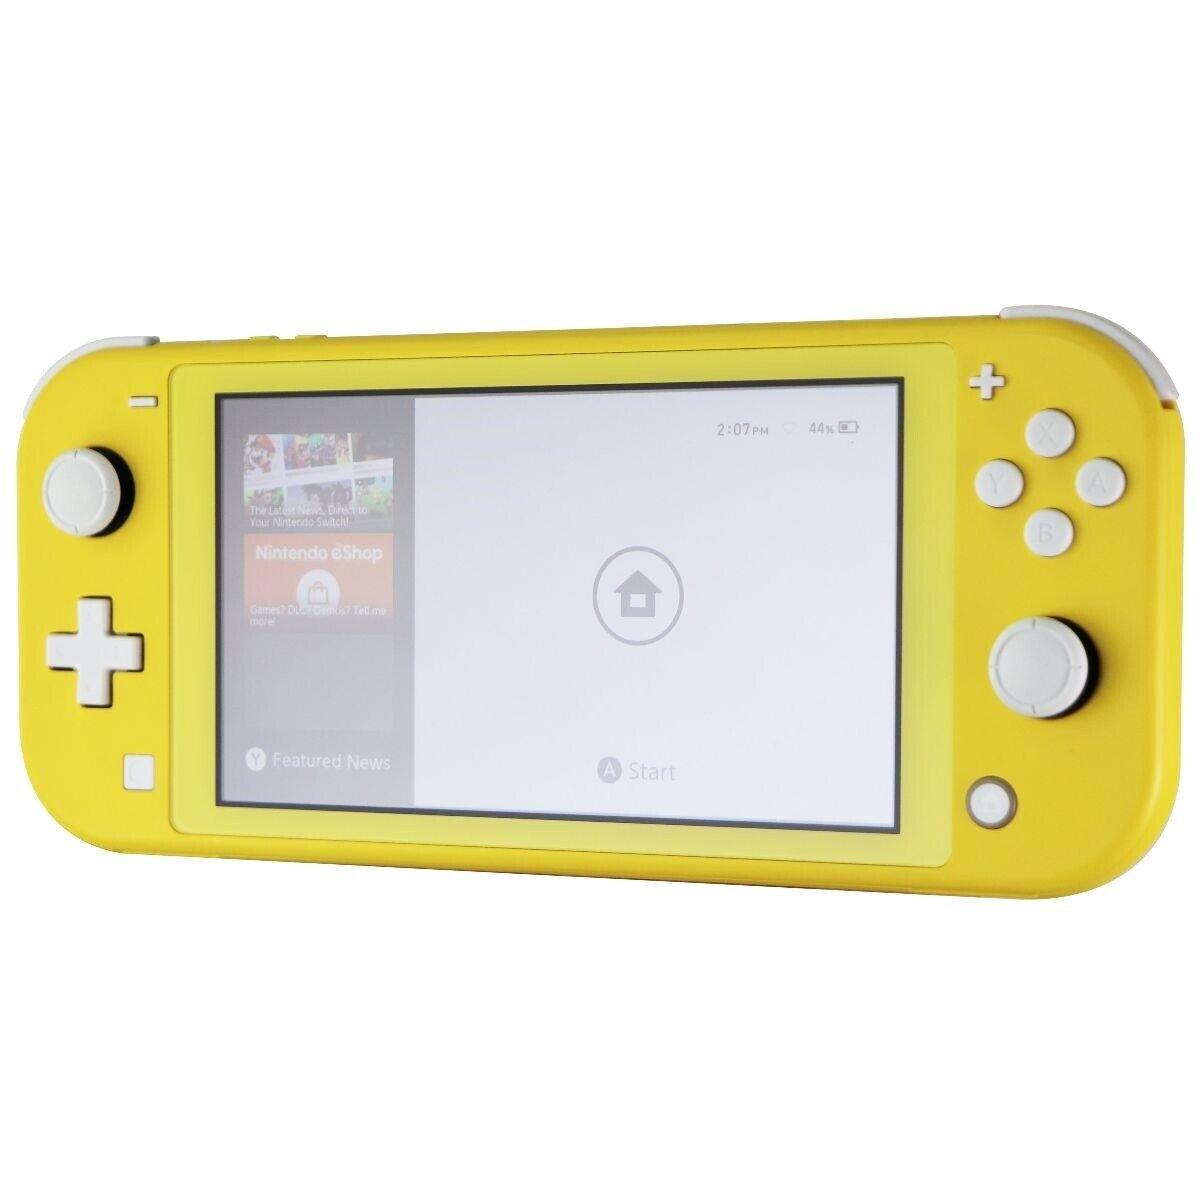 Nintendo Switch Lite Handheld Gaming Console - Yellow (HDH-001)